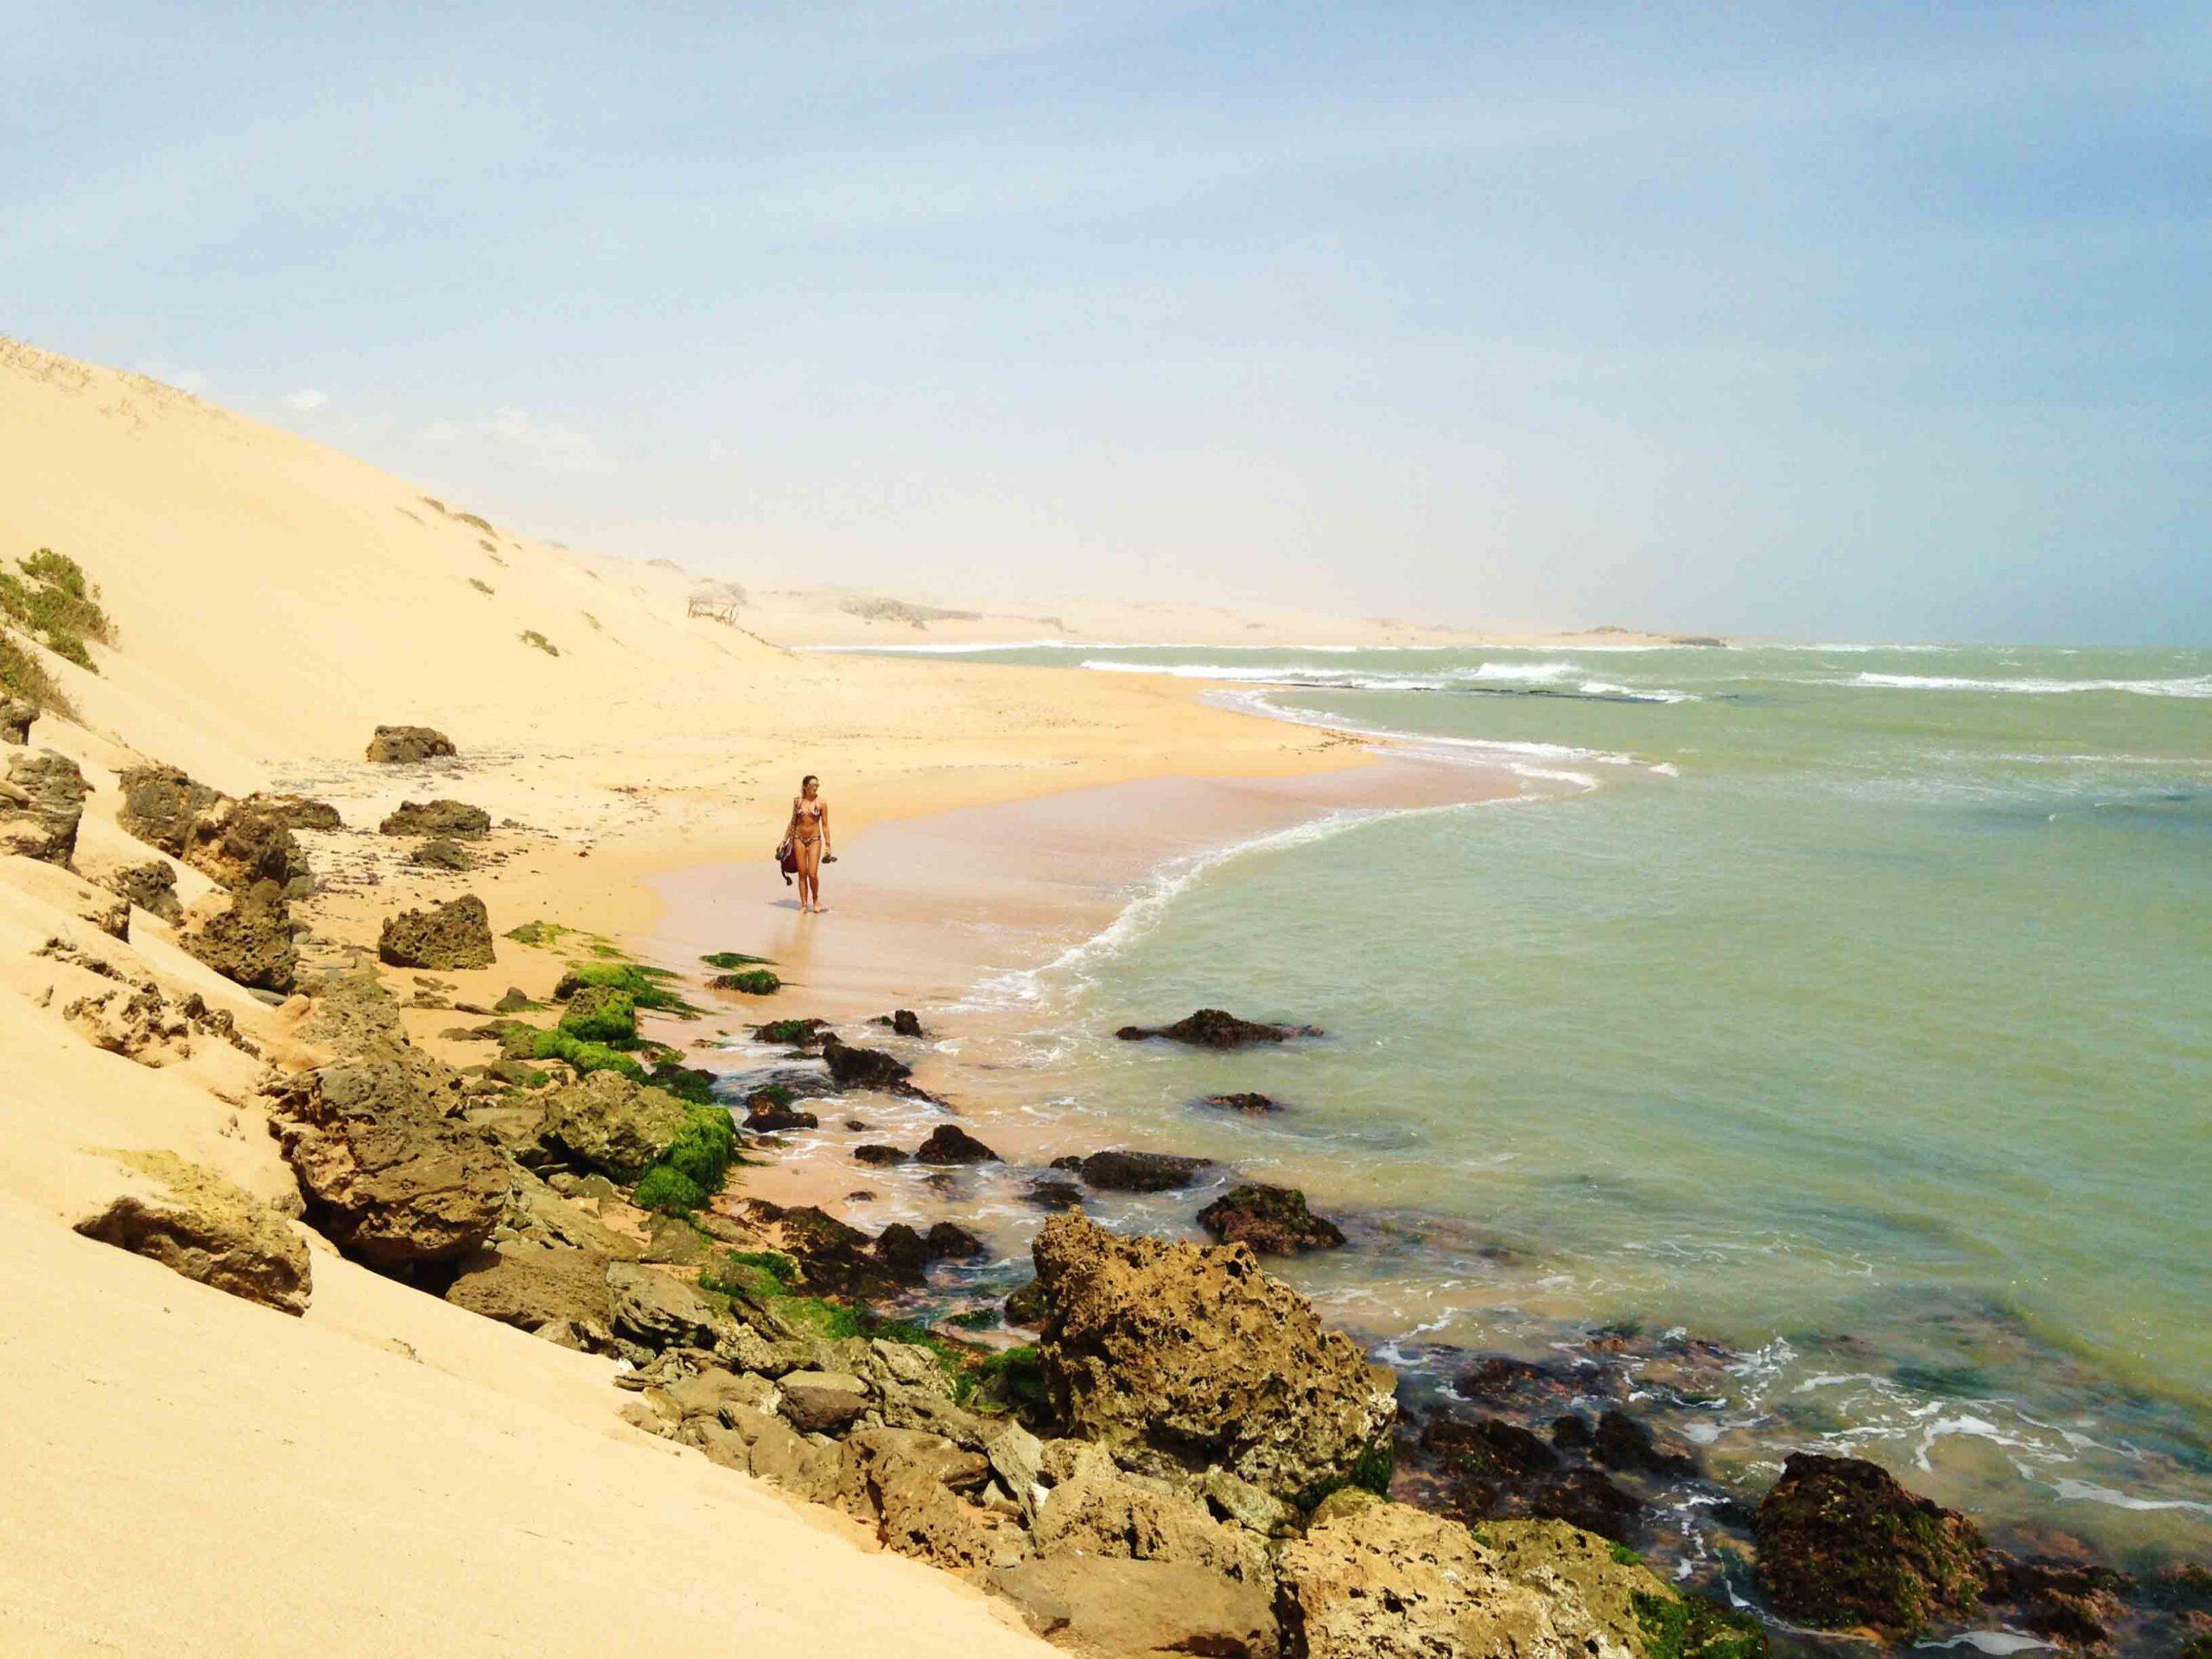 Punta Gallinas desert beach